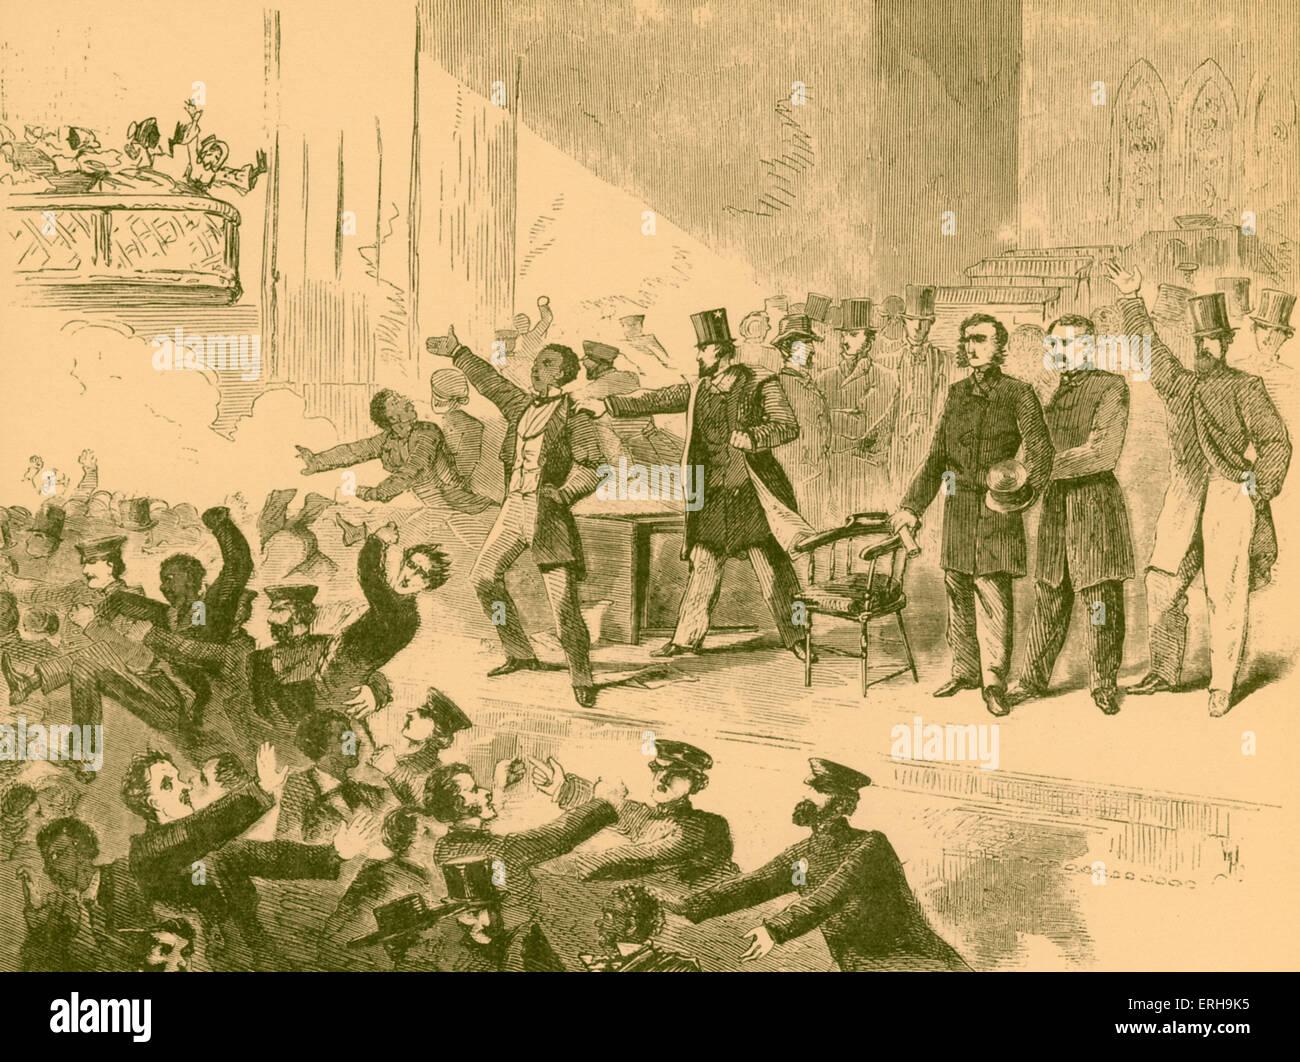 19th century abolitionist anti-slavery meeting, Virginia, America. Artist unknown, pre-Civil War. - Stock Image